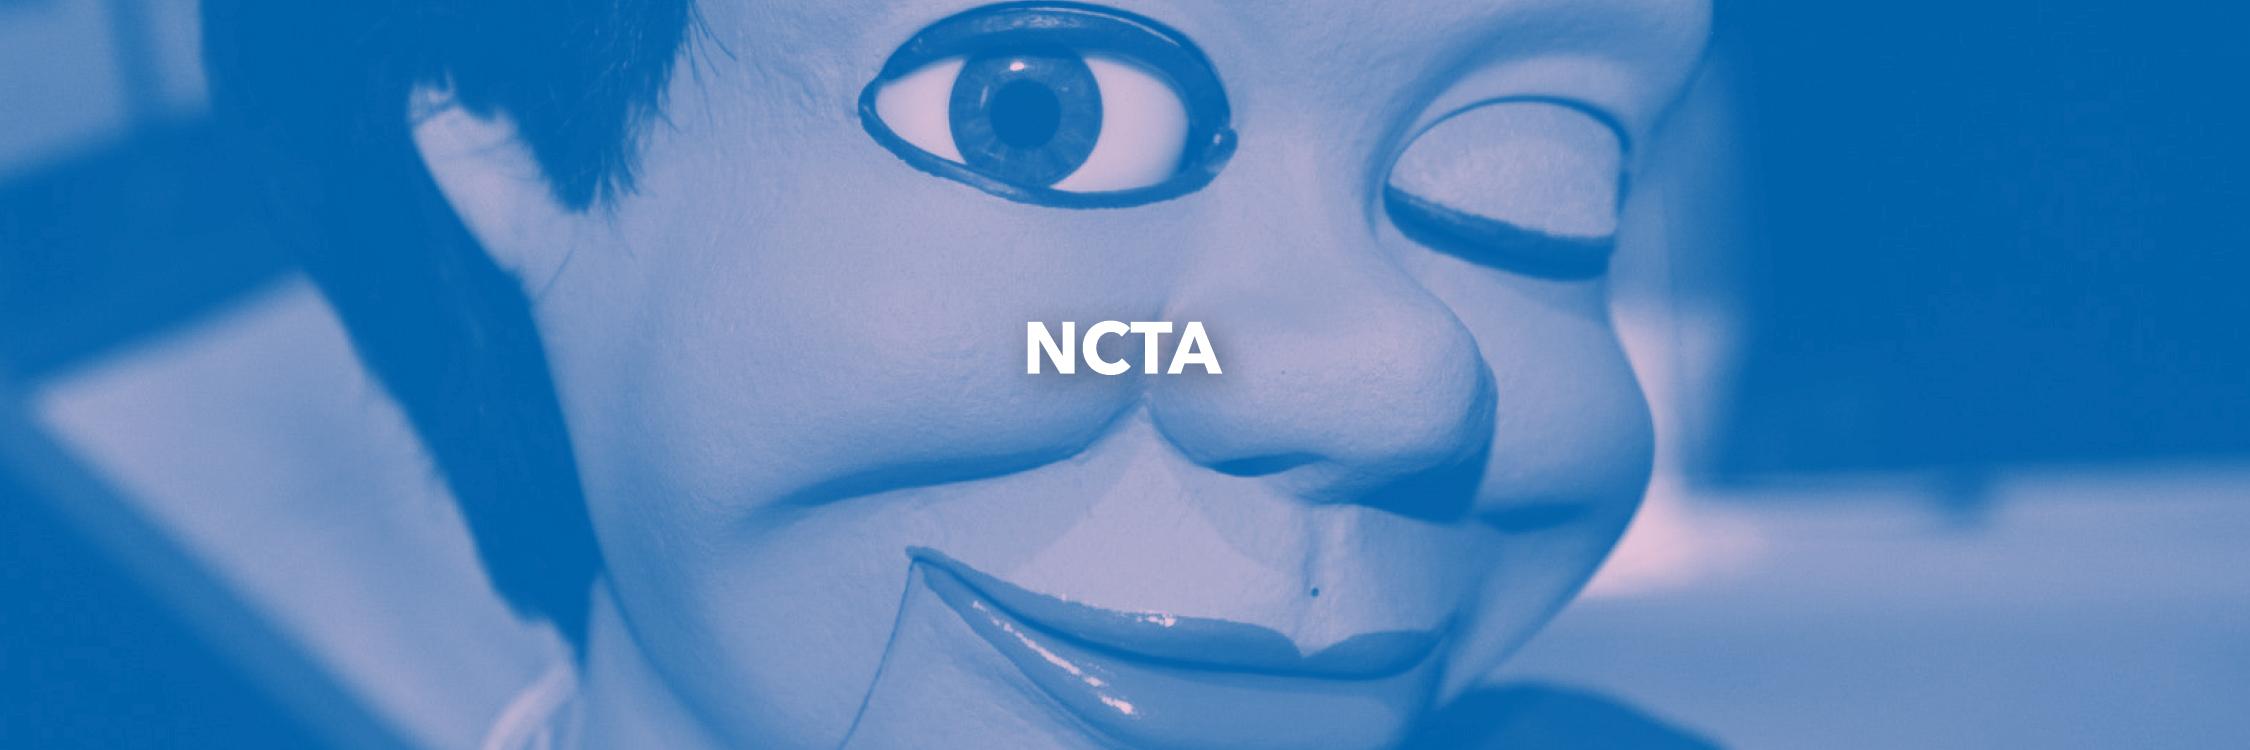 NCTA 2.jpg